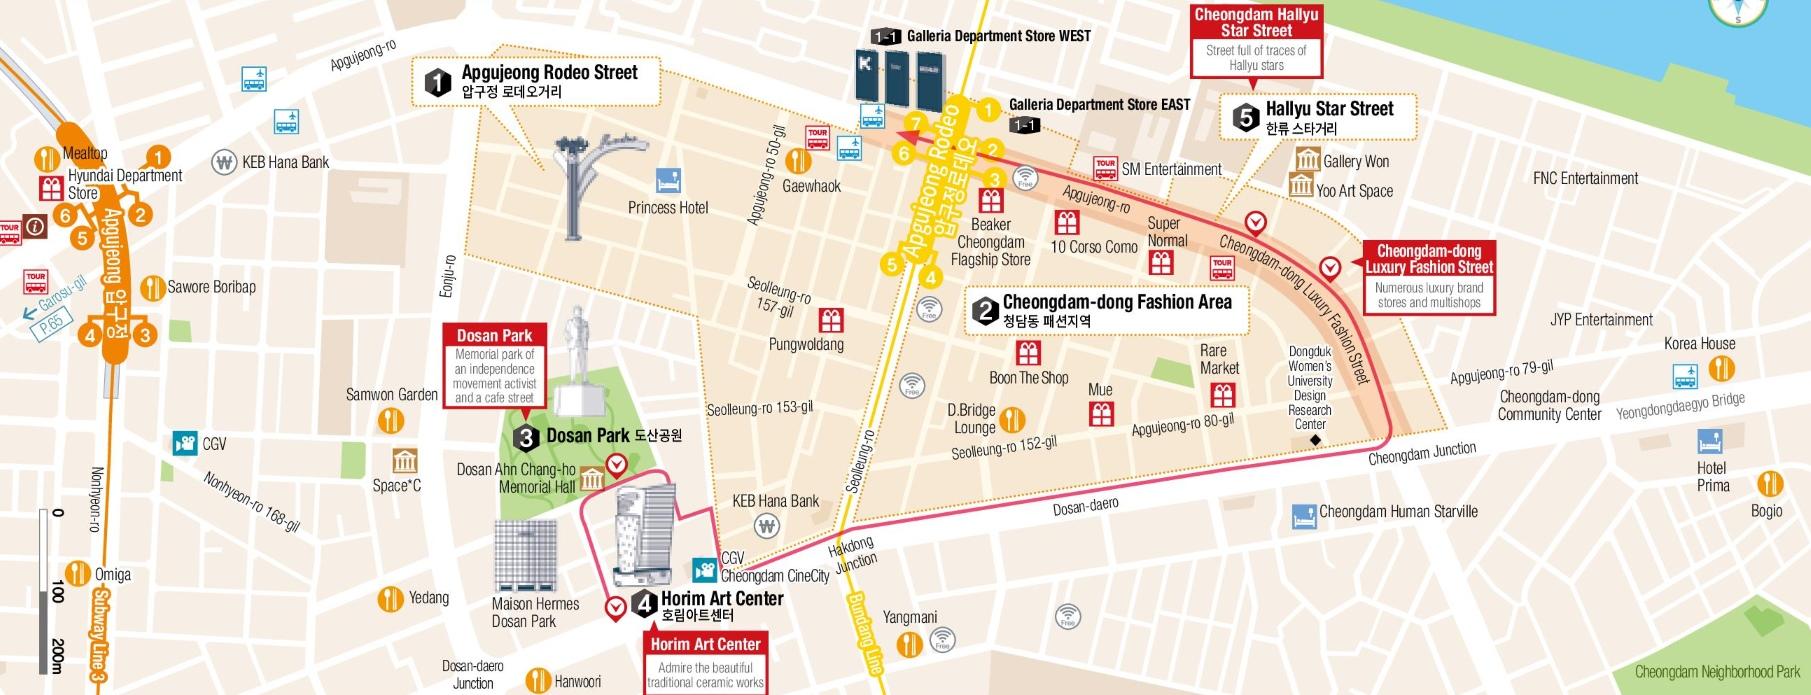 Apgujeongdong and Cheongdamdong map Seoul